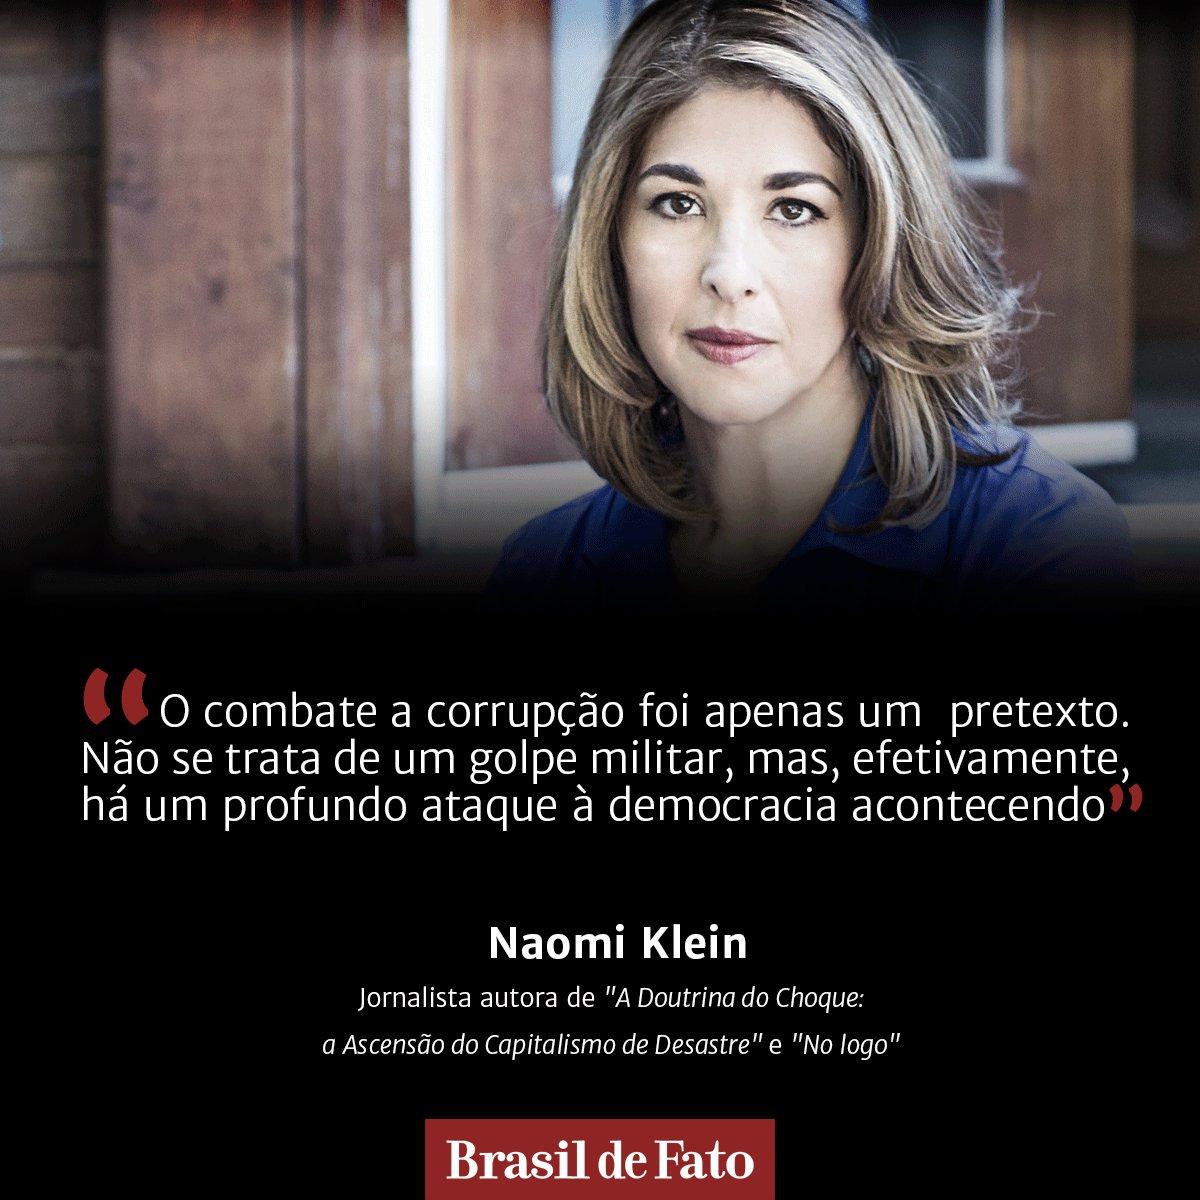 "ENTREVISTA EXCLUSIVA | ""Democracia brasileira está sob ataque"", afirma Naomi Klein https://t.co/Q59F2xva5F https://t.co/ZNi8KqtnTr"